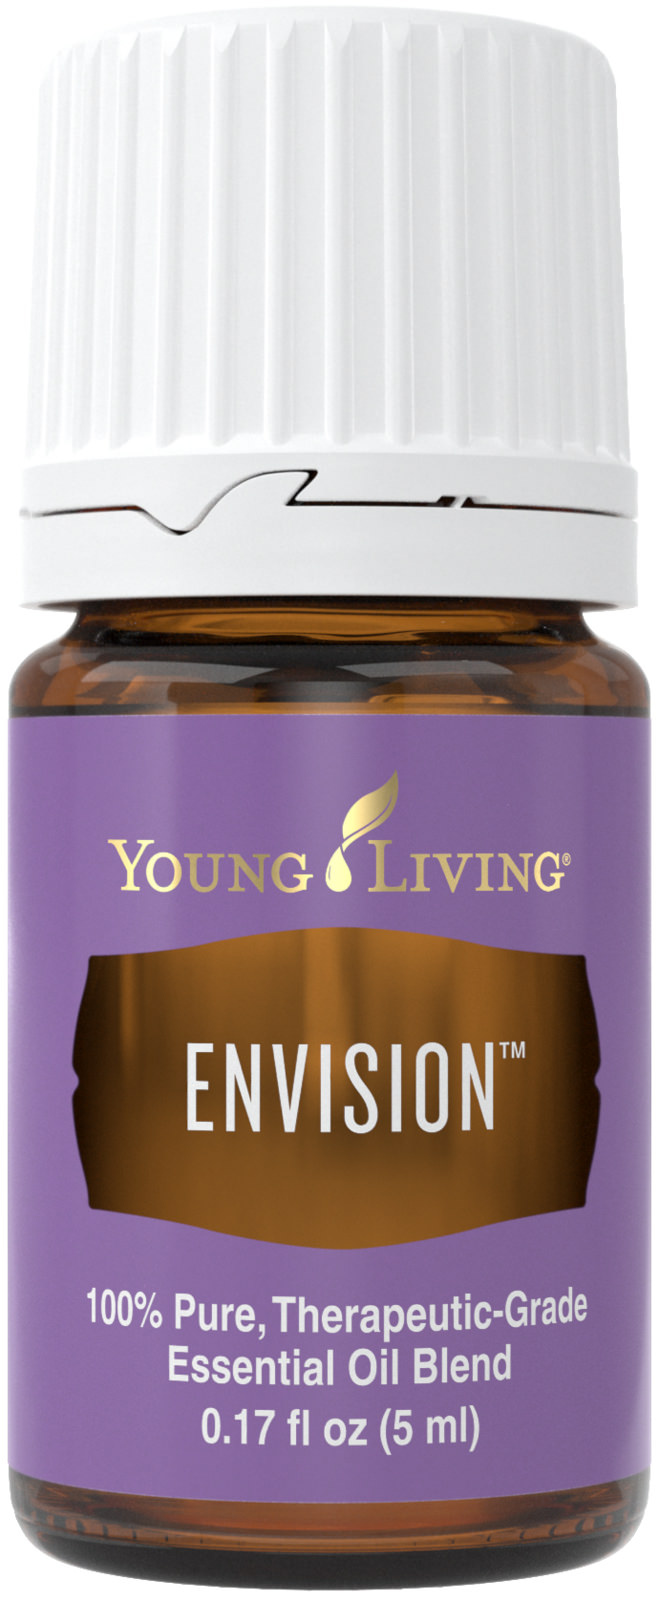 envision essential oil blend